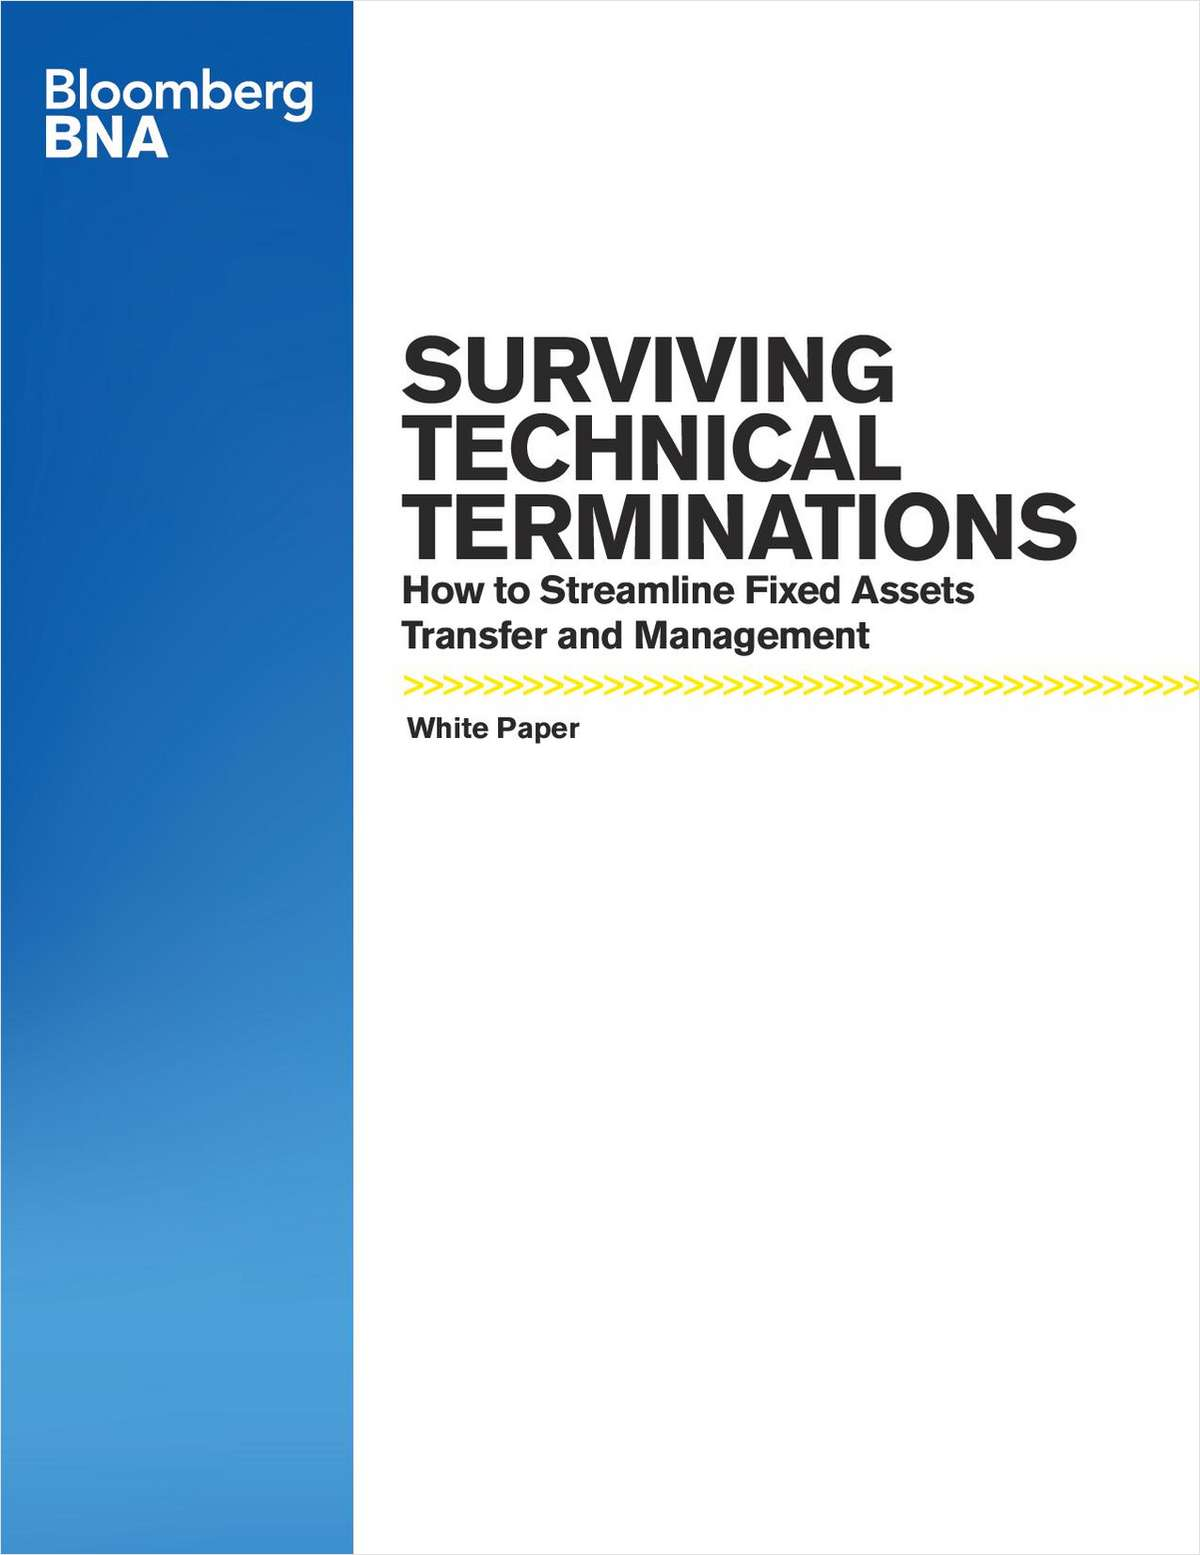 Surviving Technical Terminations